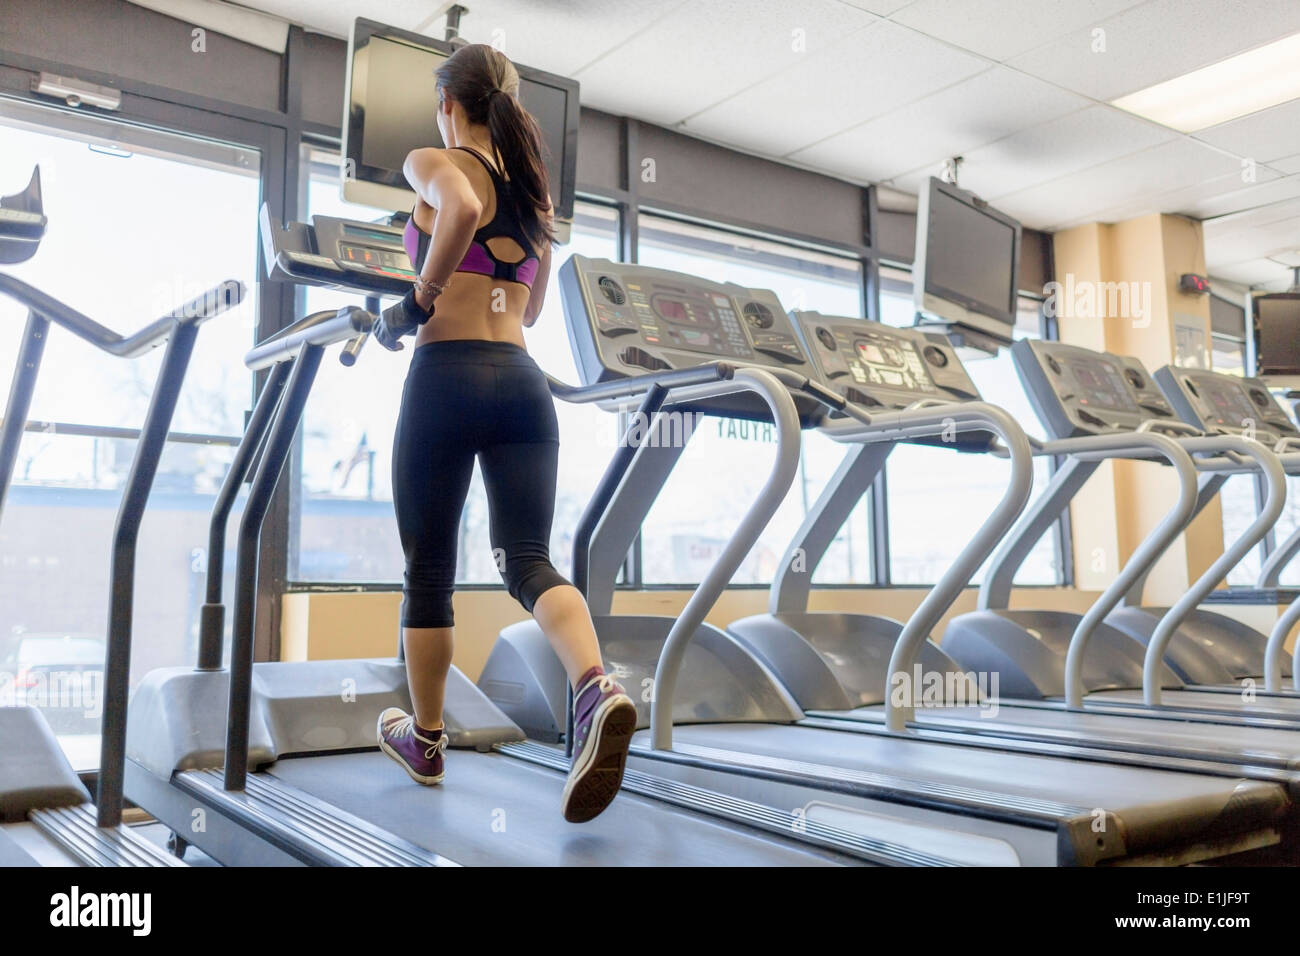 Mitte Erwachsene Frau auf Laufband im Fitnessstudio Stockbild